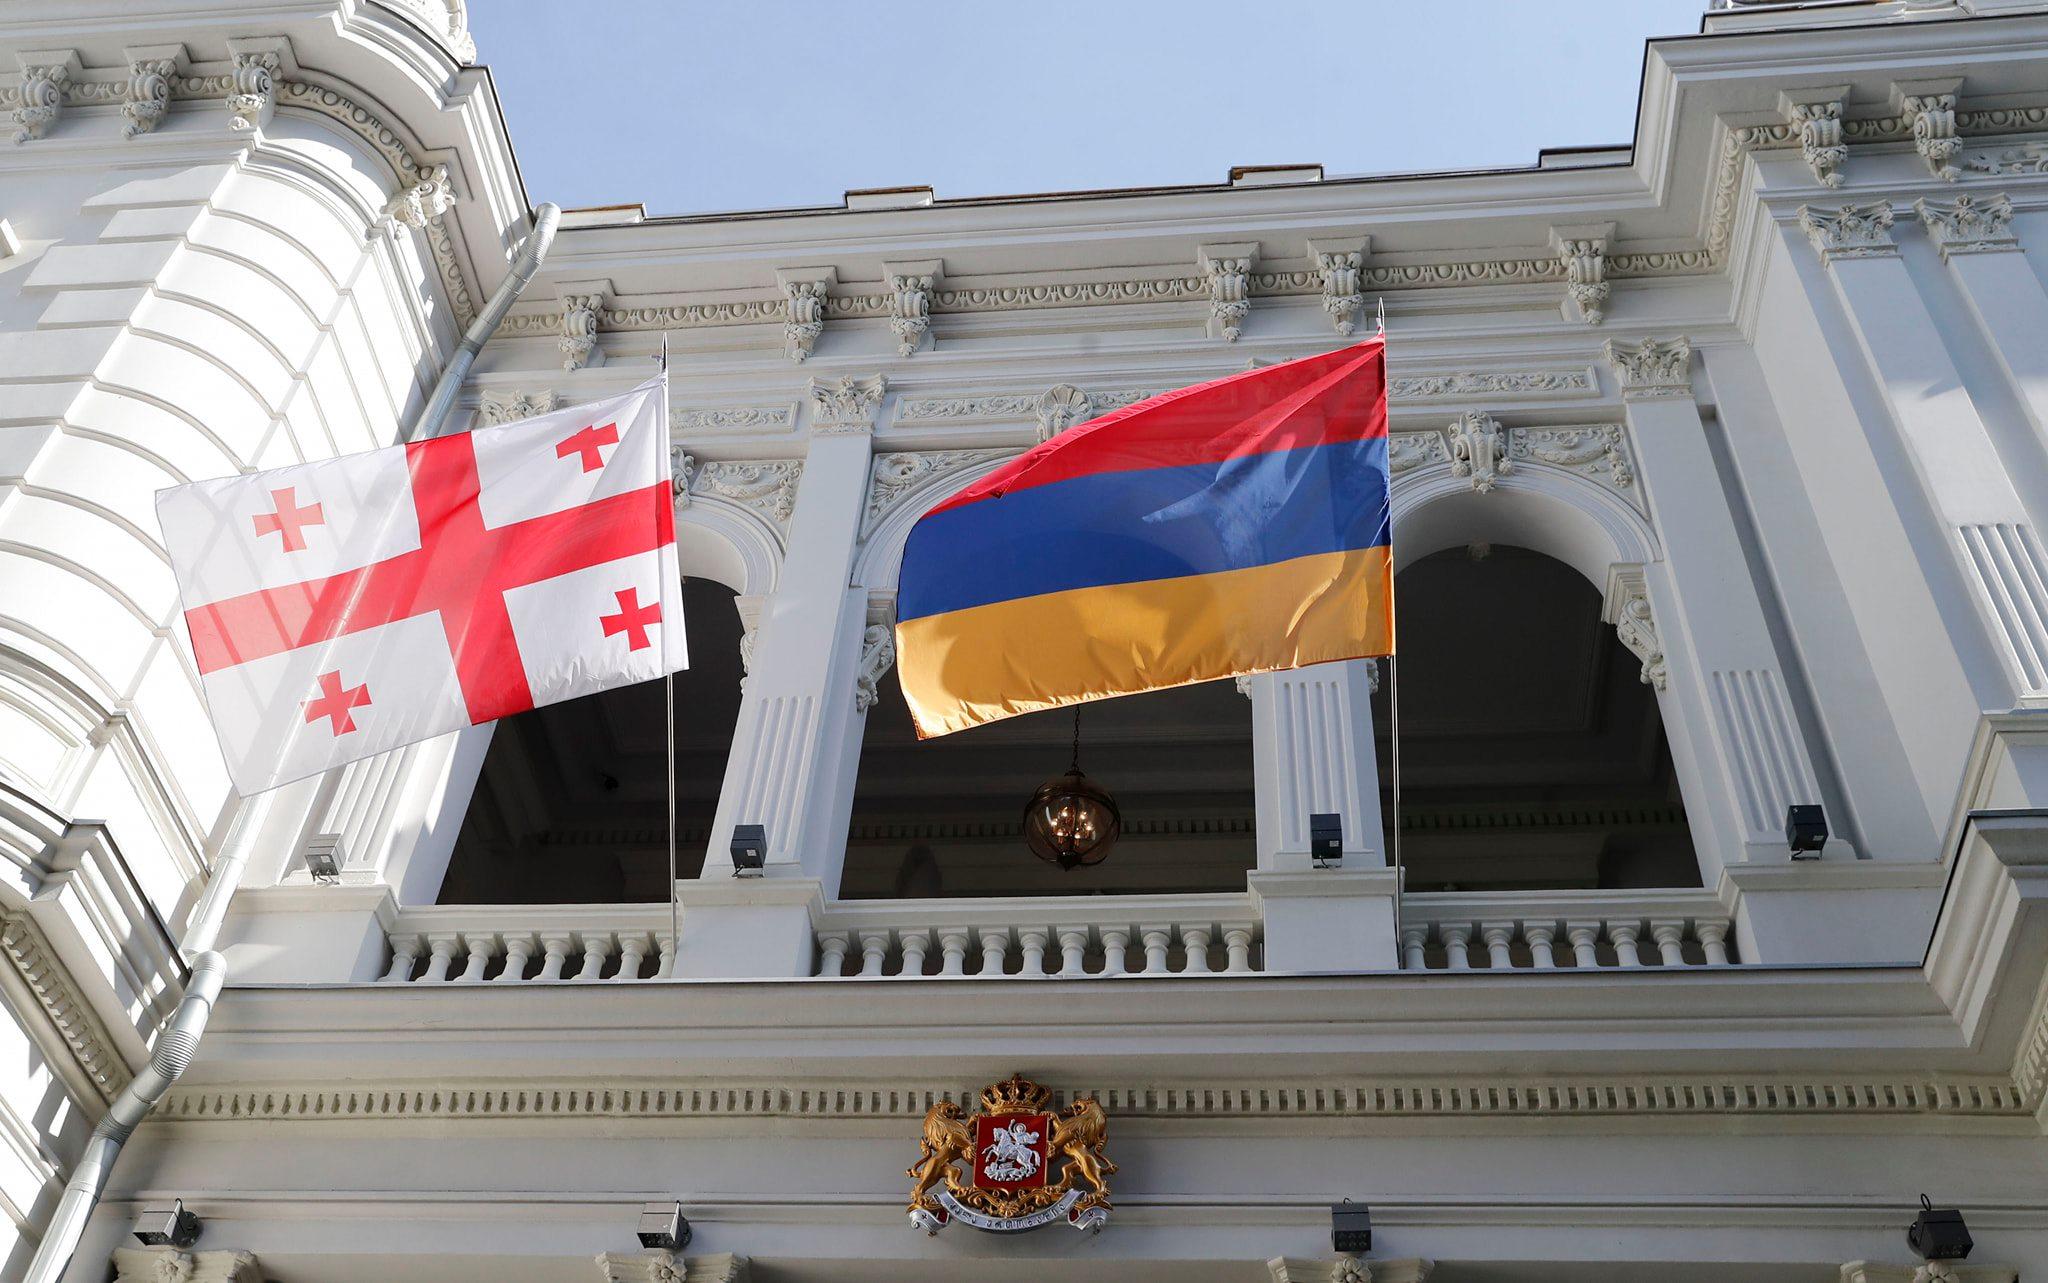 Georgia Armenia Flags 2 #новости Батуми, Грузия-Армения